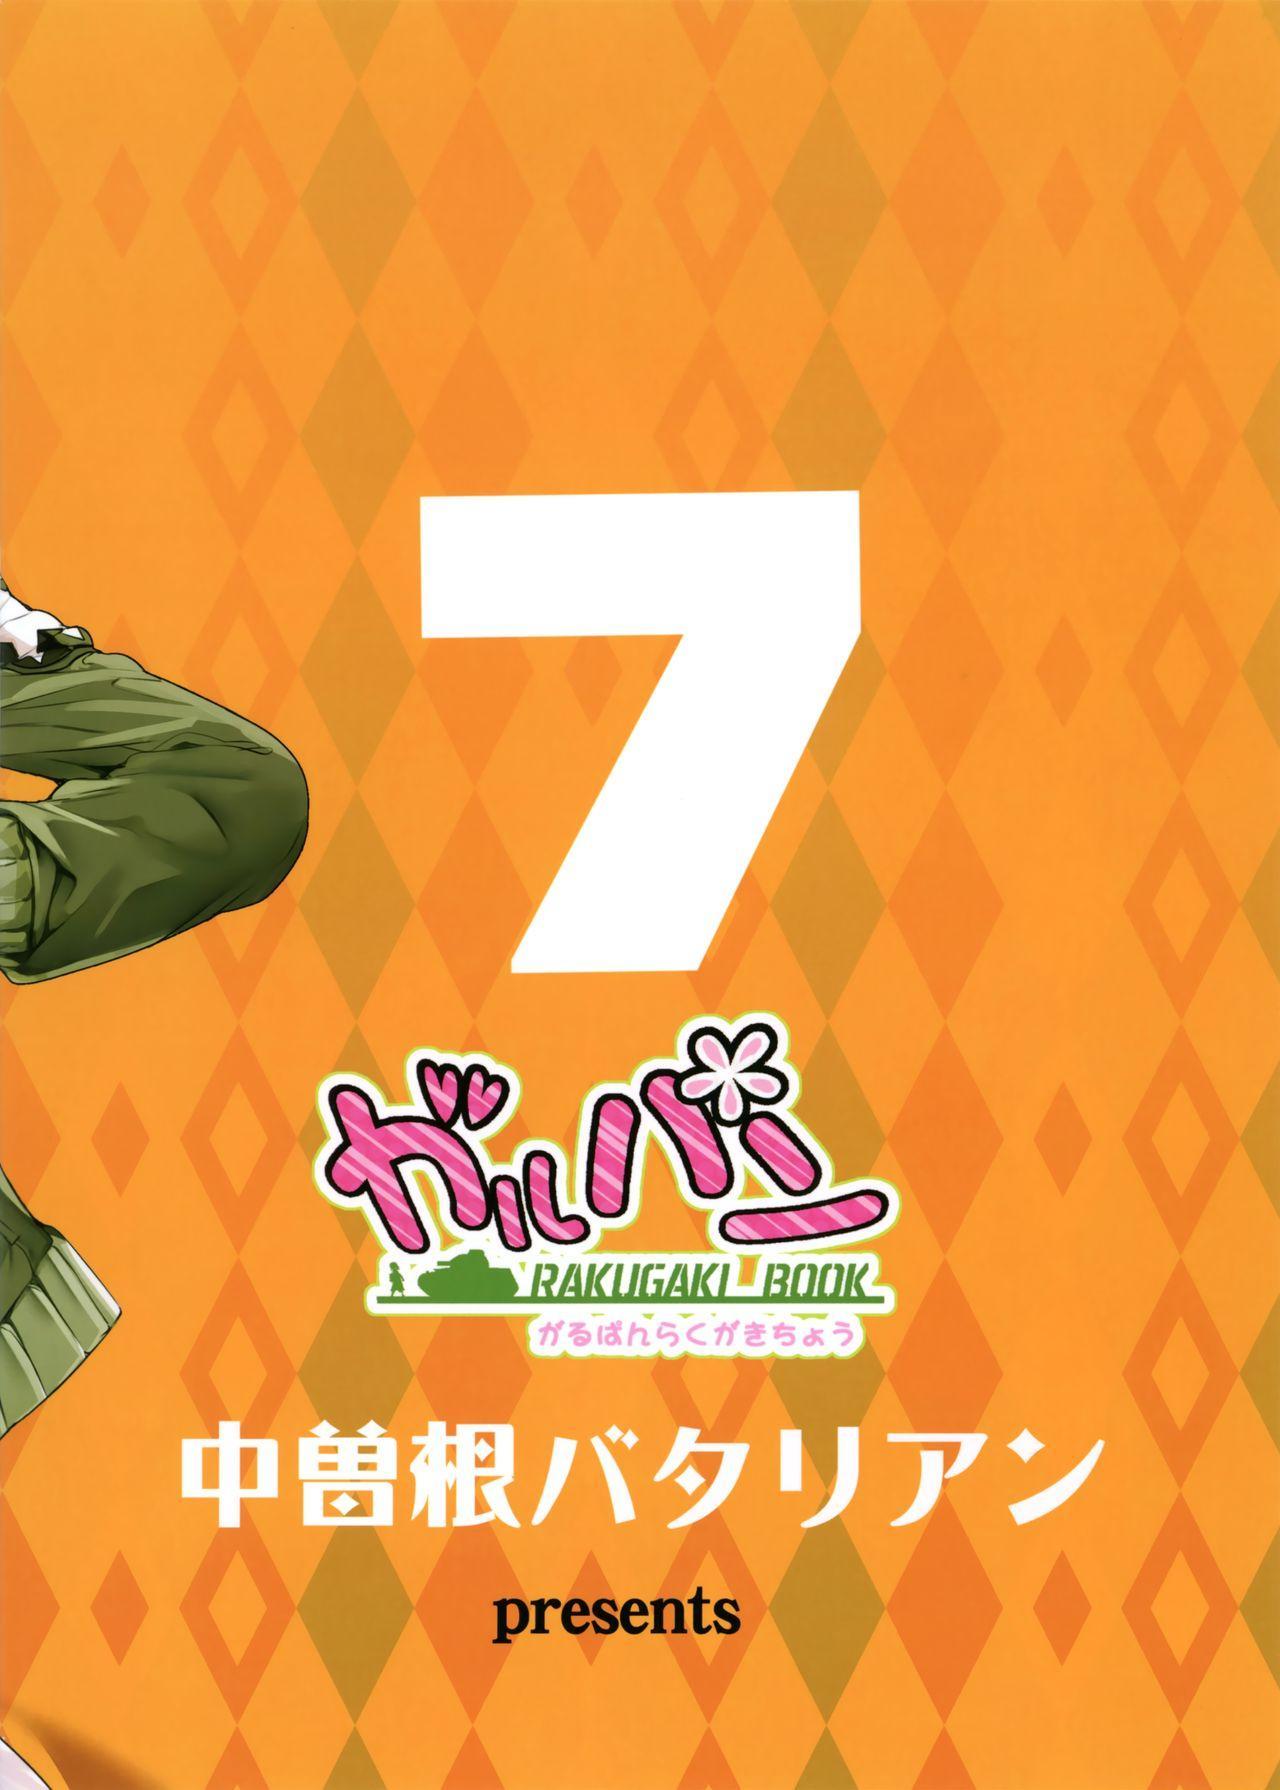 GirlPan Rakugakichou 7 27